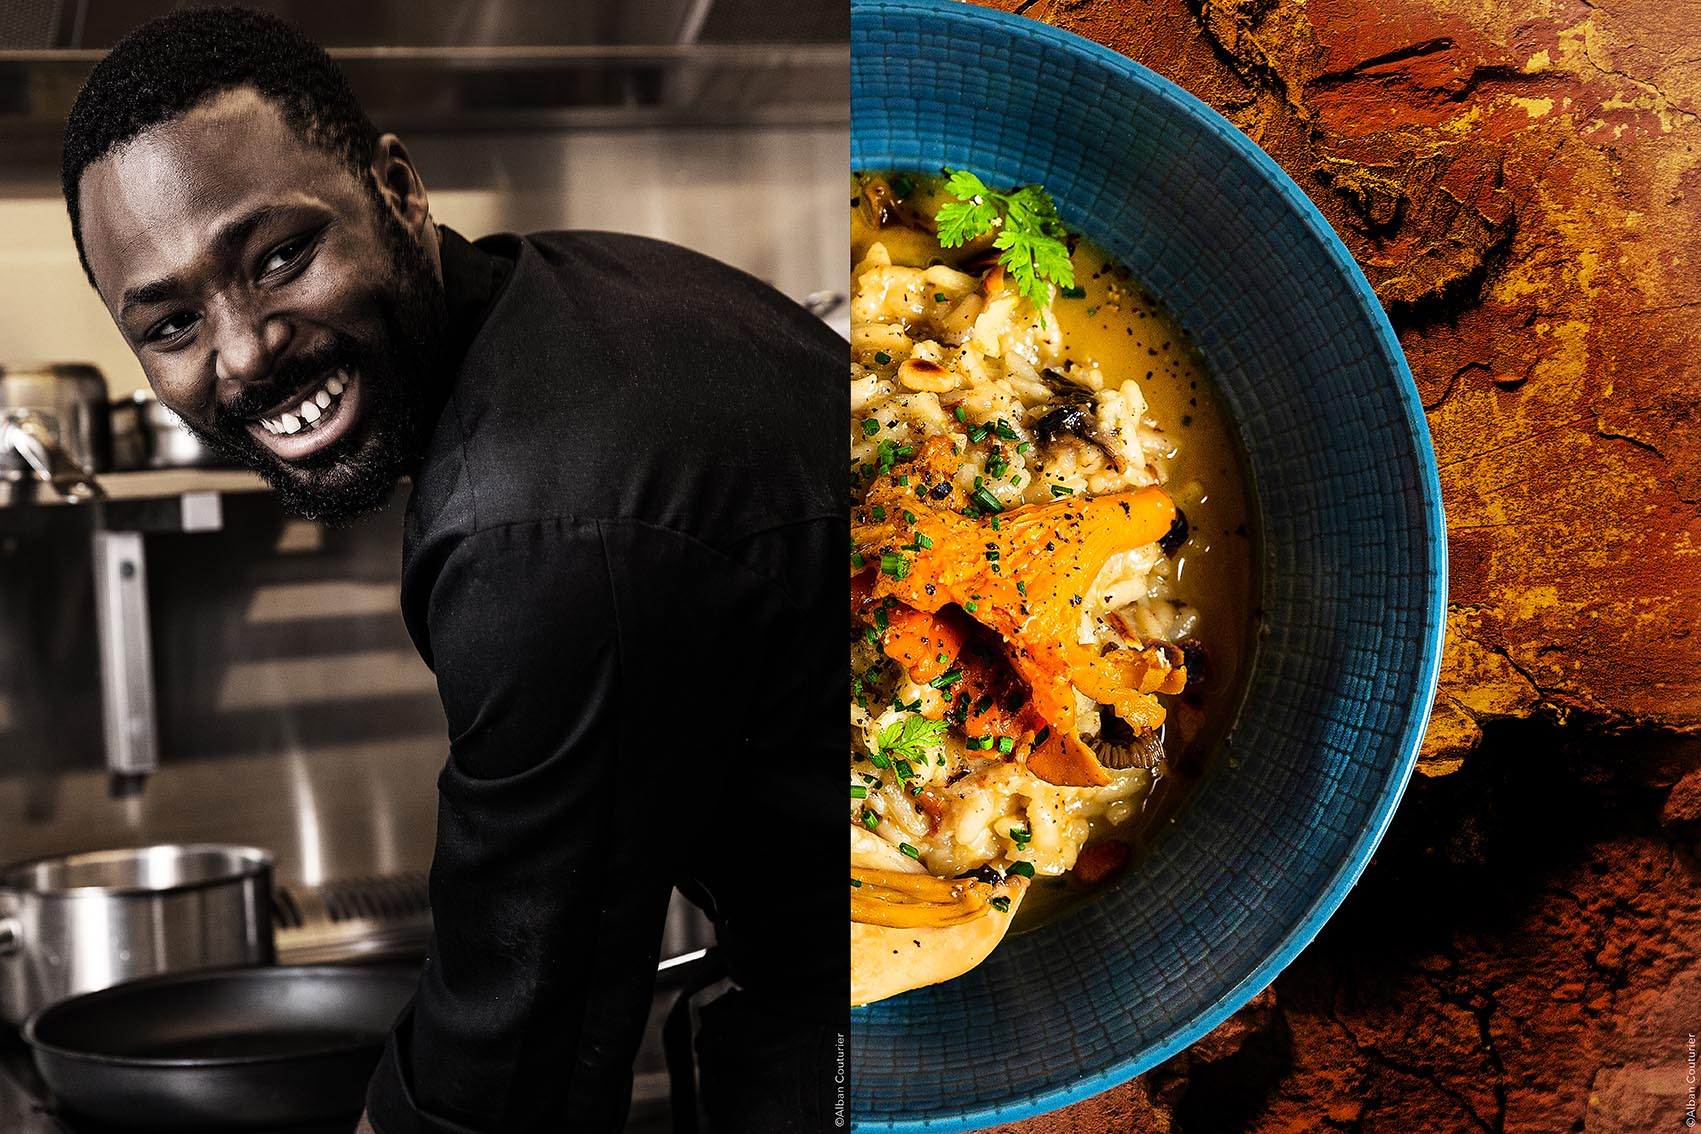 Chef Ibrahima sylla, restaurant Le Reflet Paris, Risotto aux champignons ©Alban Couturier